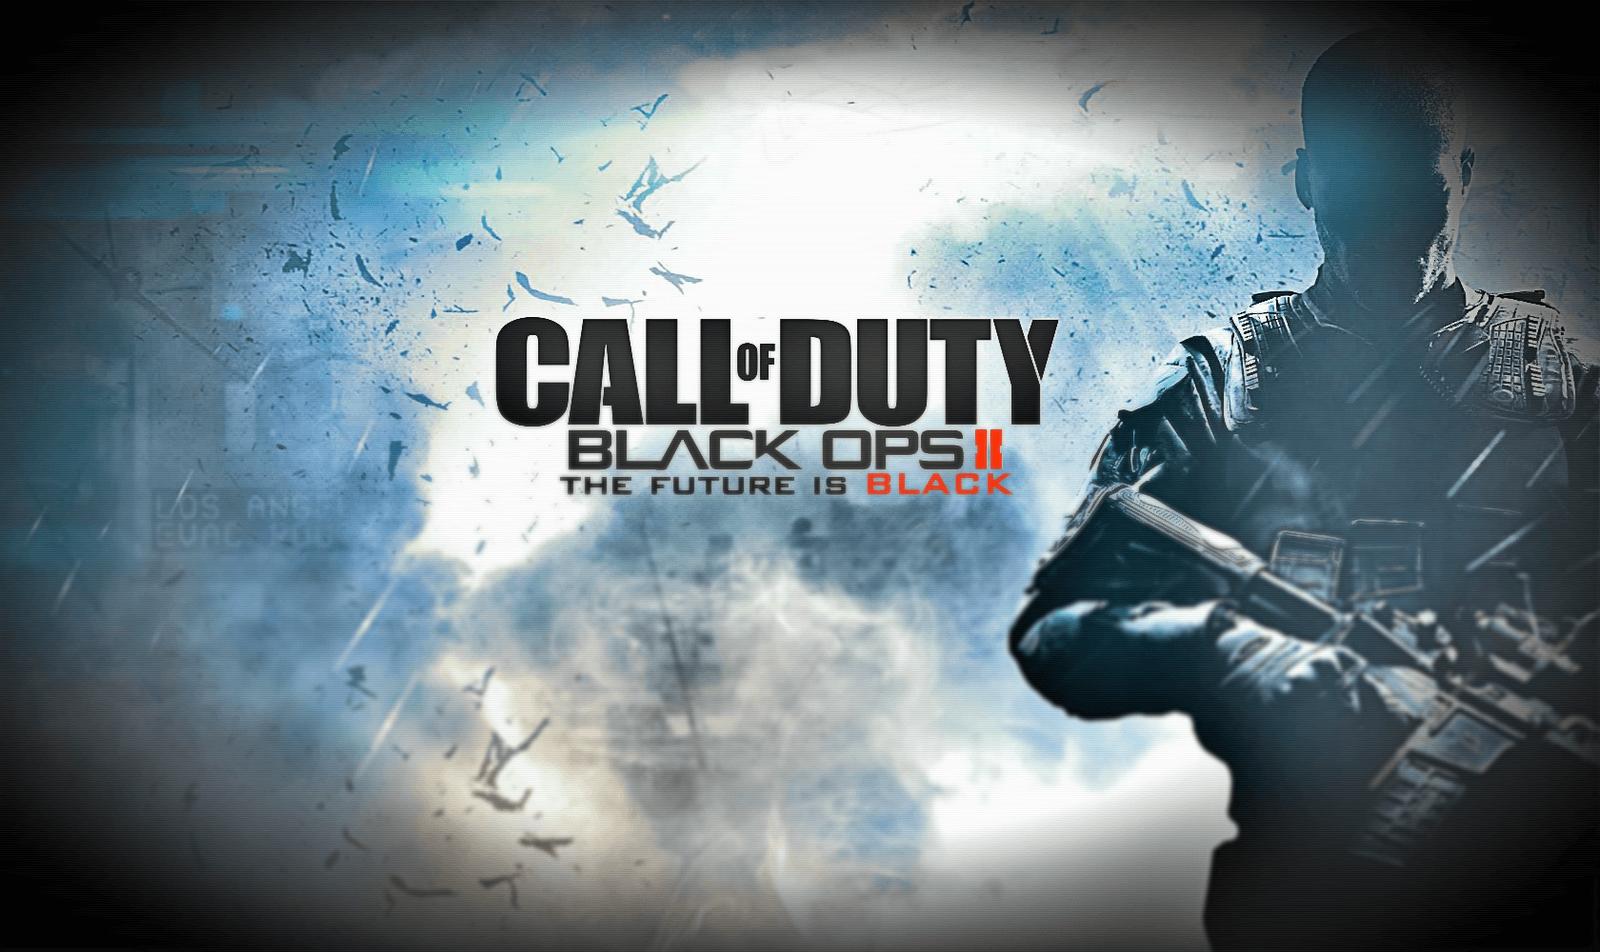 Hd Wallpapers Call Of Duty Black Ops 2 Hd Wallpapers Call Of Duty Black Call Duty Black Ops Call Of Duty